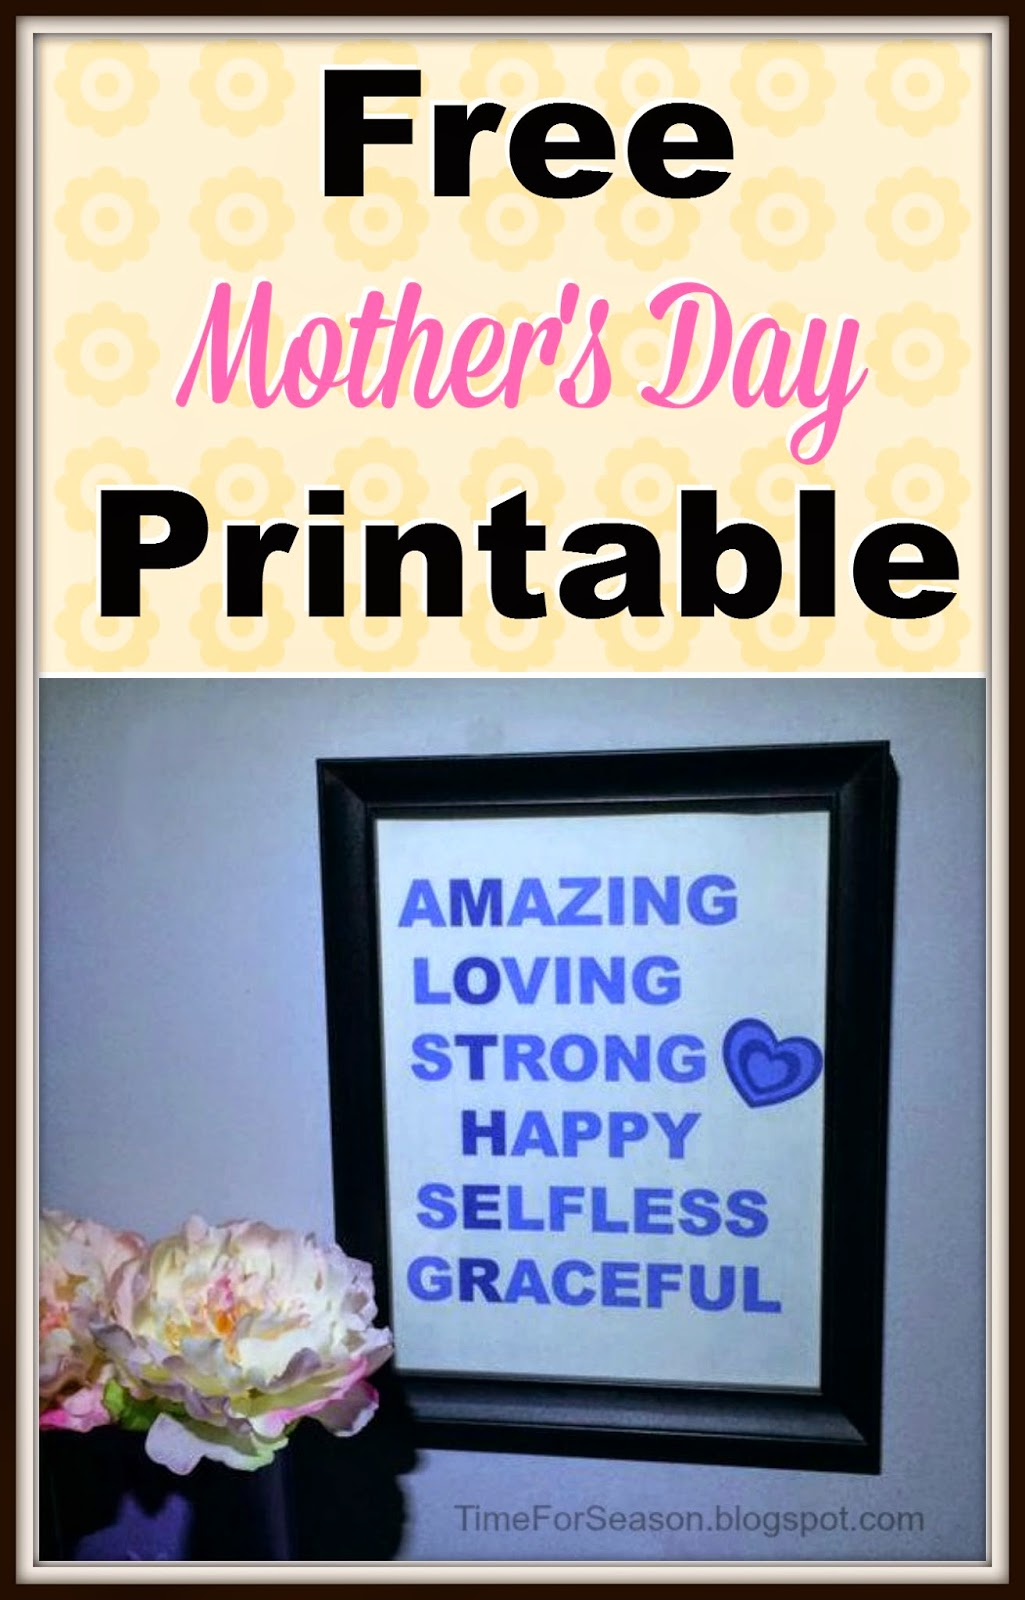 http://timeforseason.blogspot.com/2014/05/mothers-day-printable-poem-free.html